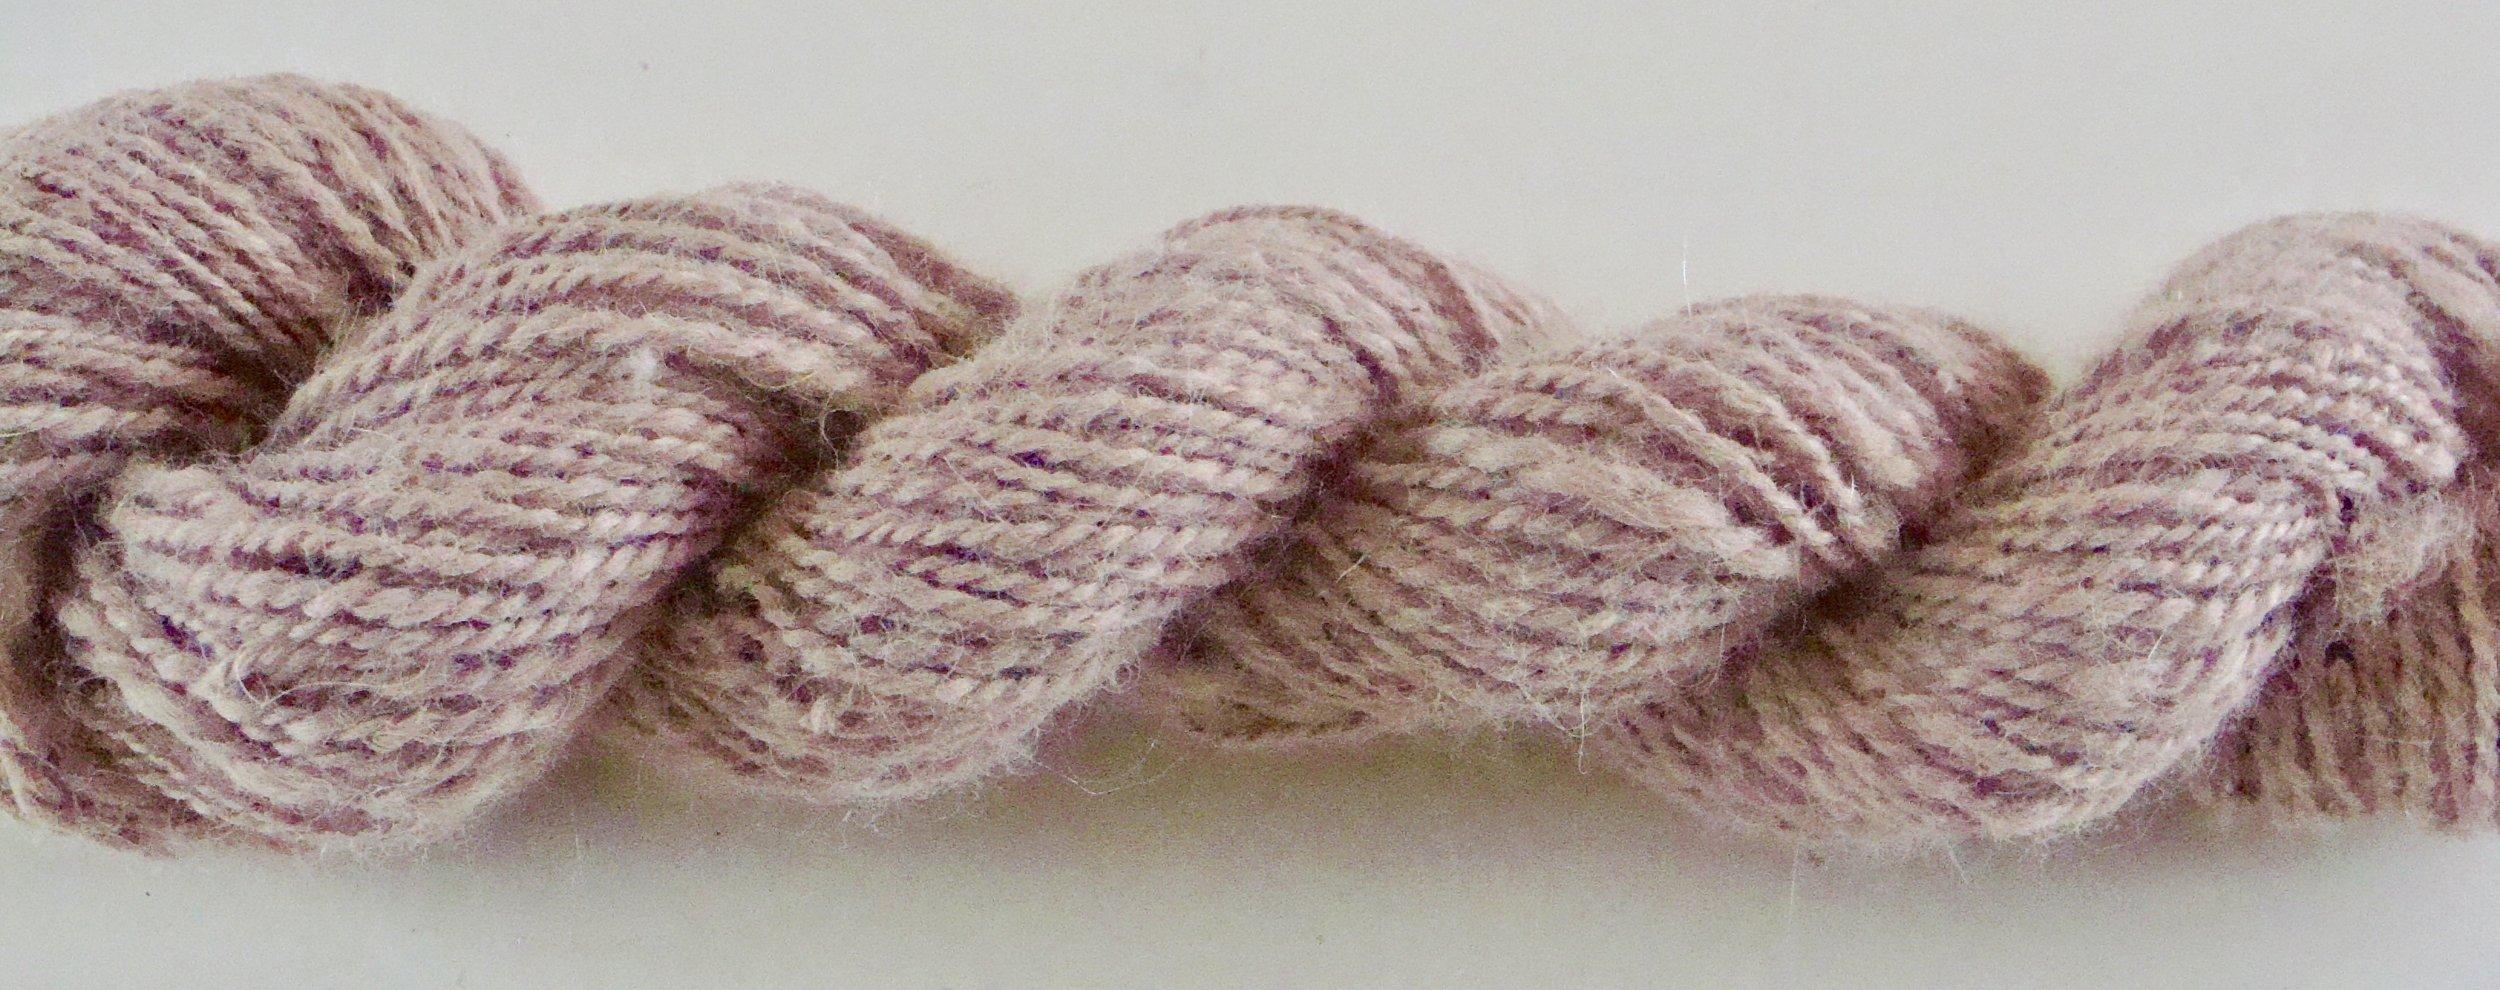 handspun naturally dyed alpaca yarn